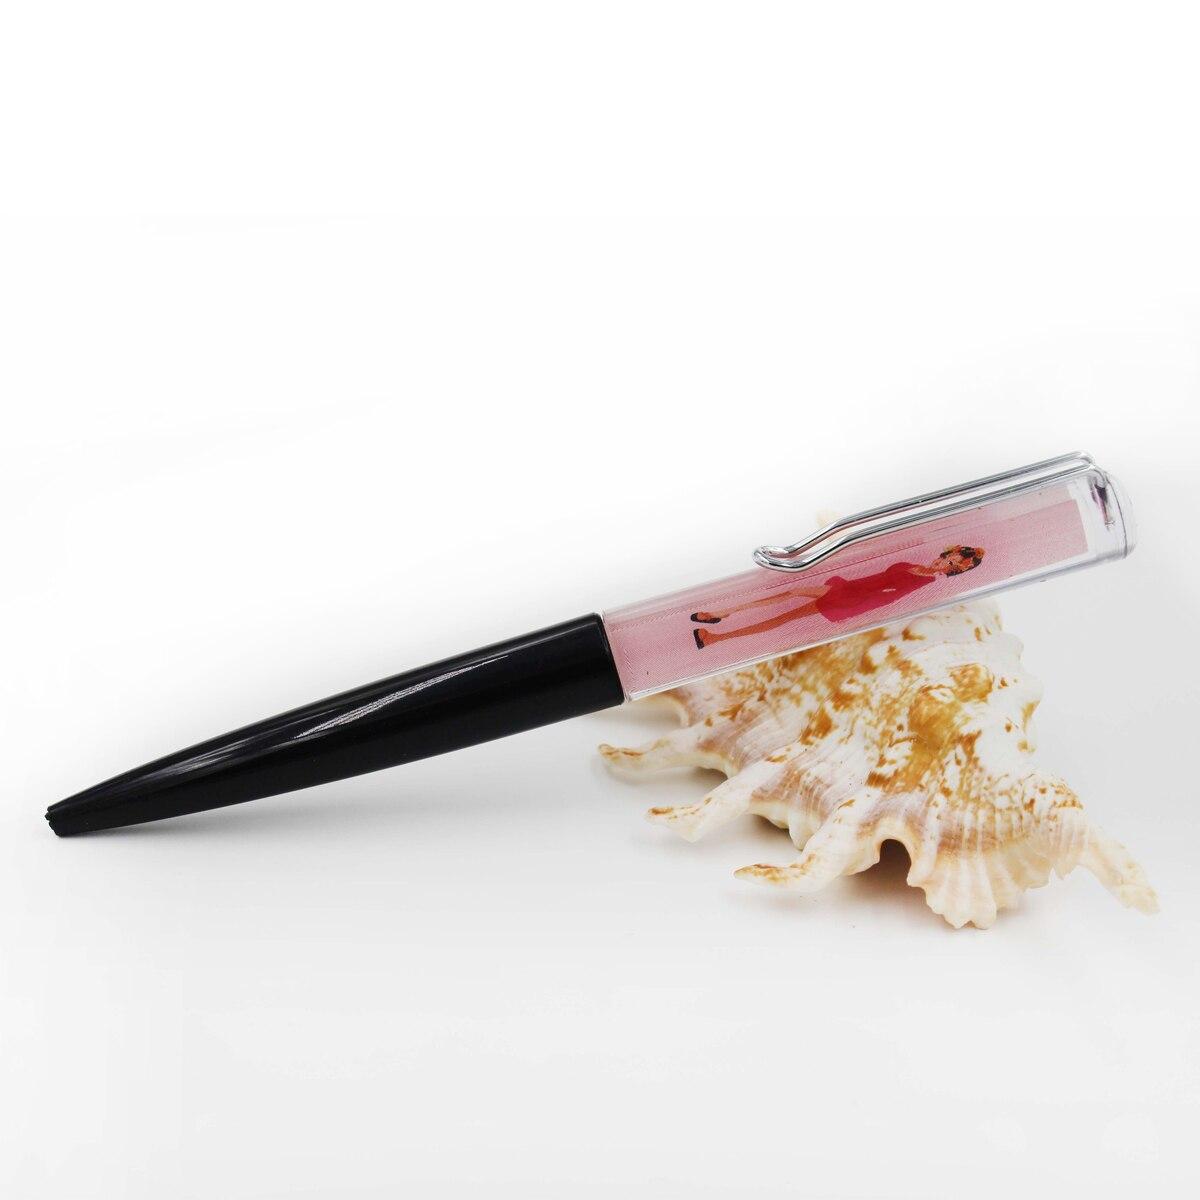 Women Undress Liquid Pens Take Off Clothes Floater Liquid Ballpoint Pens 2D Floater Floating Pen Fancy Ballpoint Pens